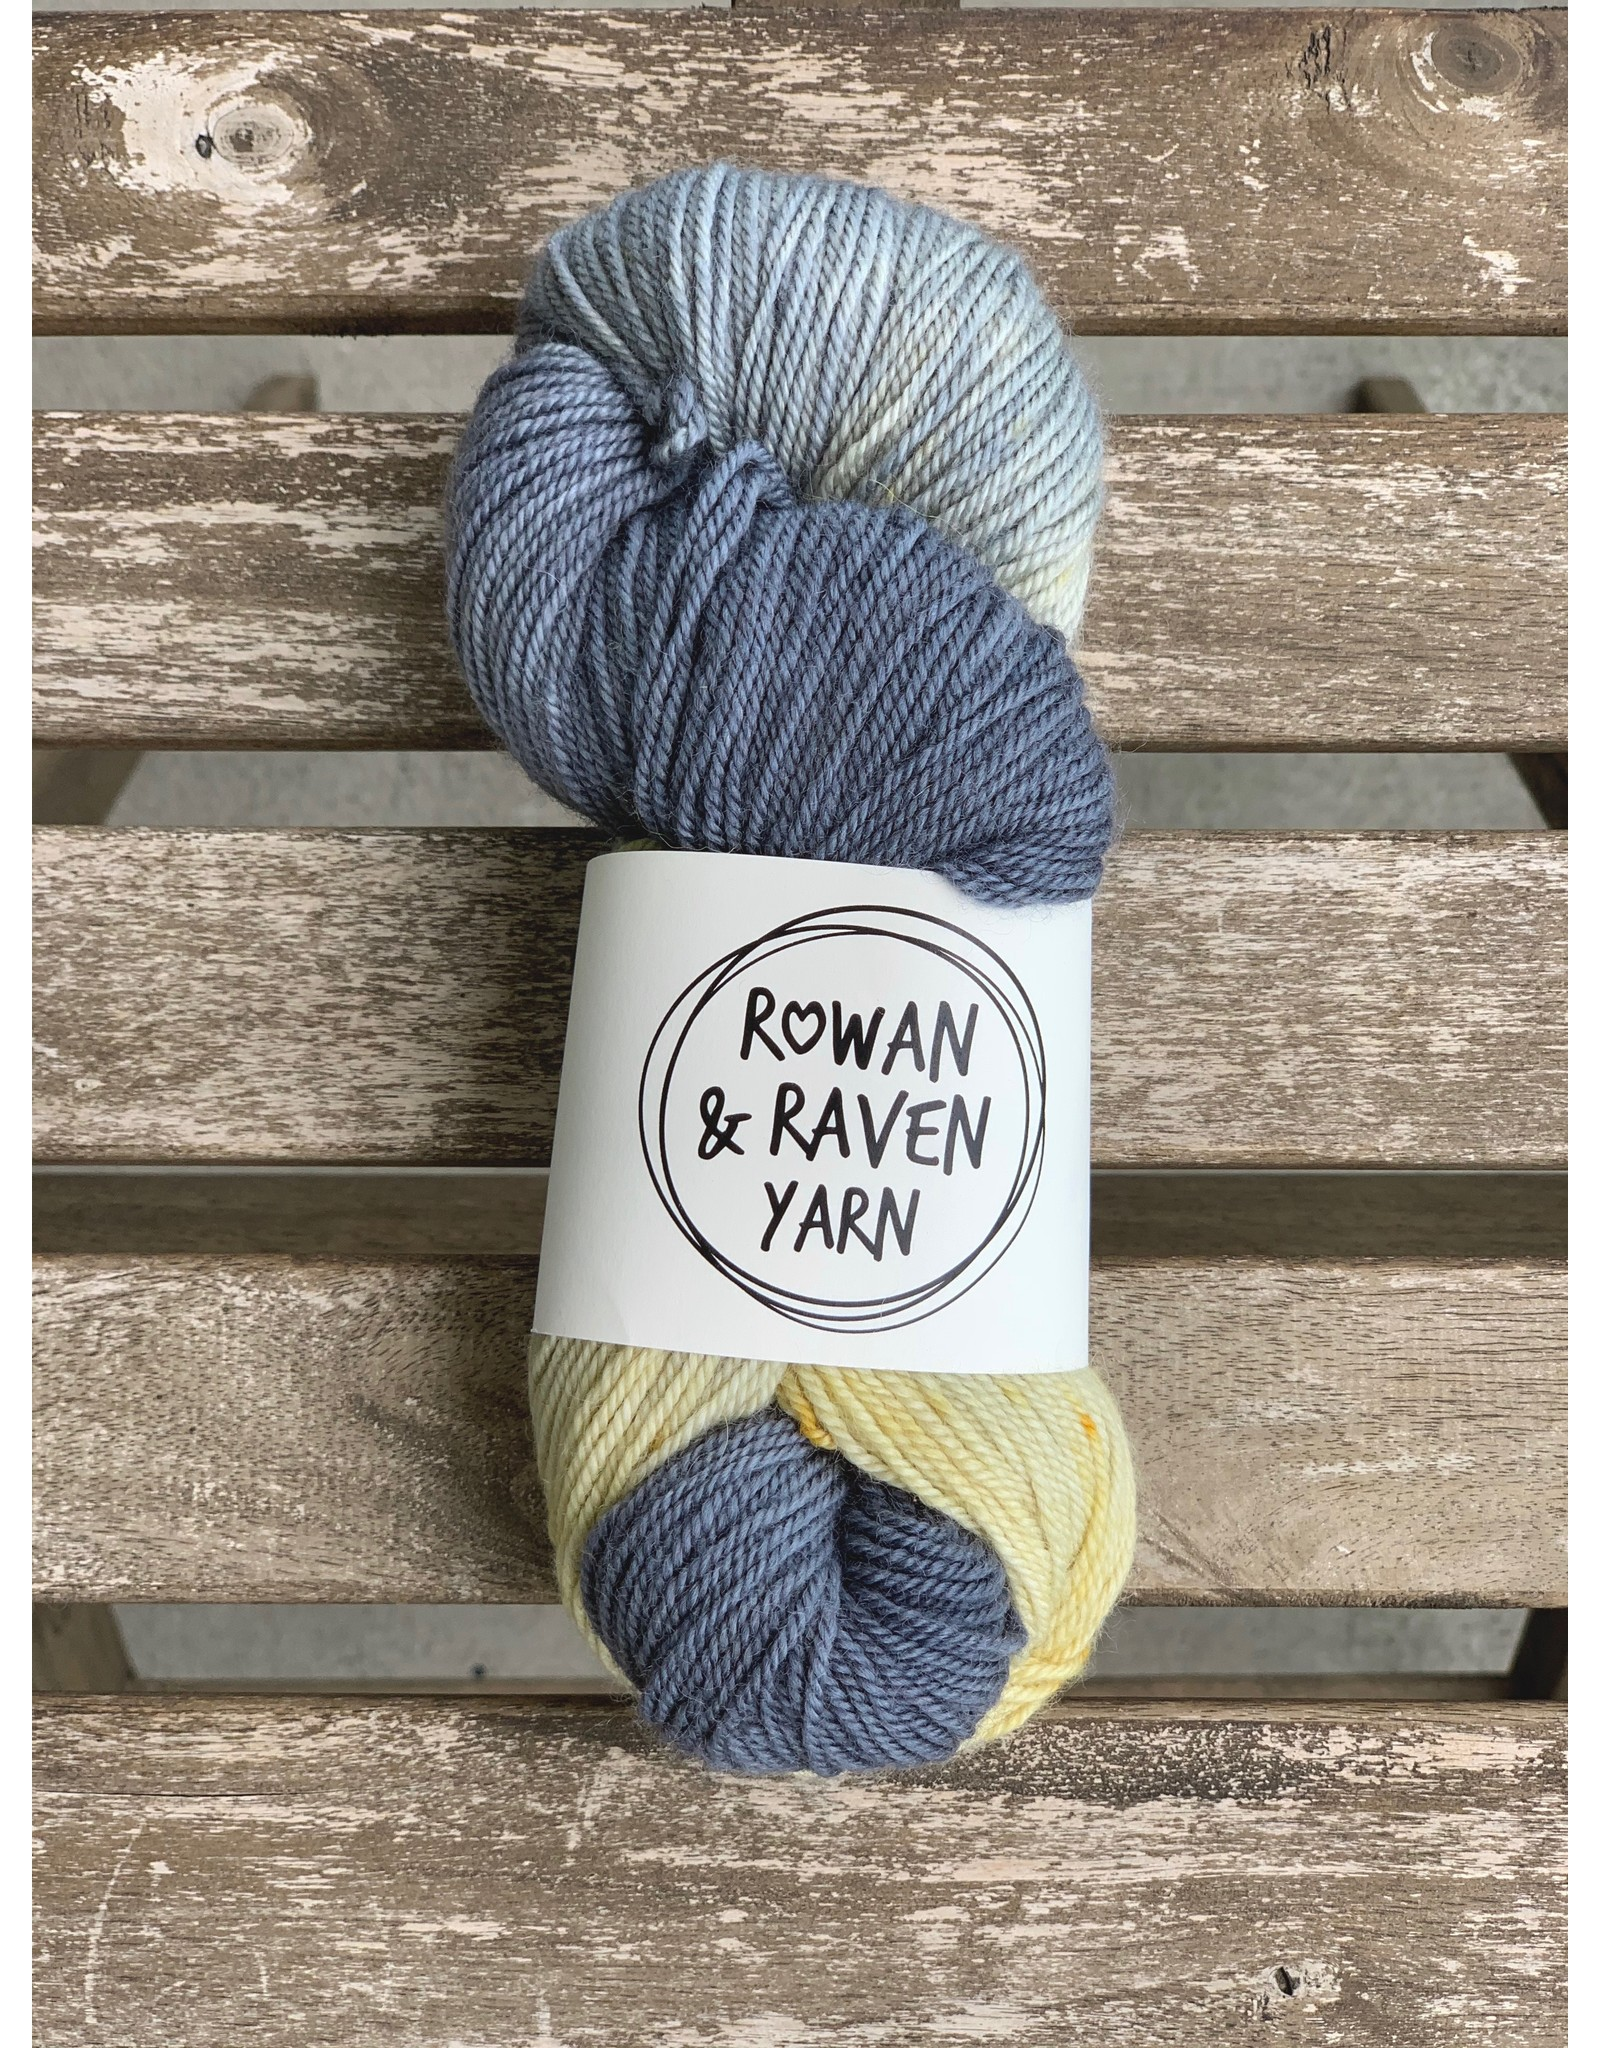 Rowan & Raven Rowan & Raven BFL Squish